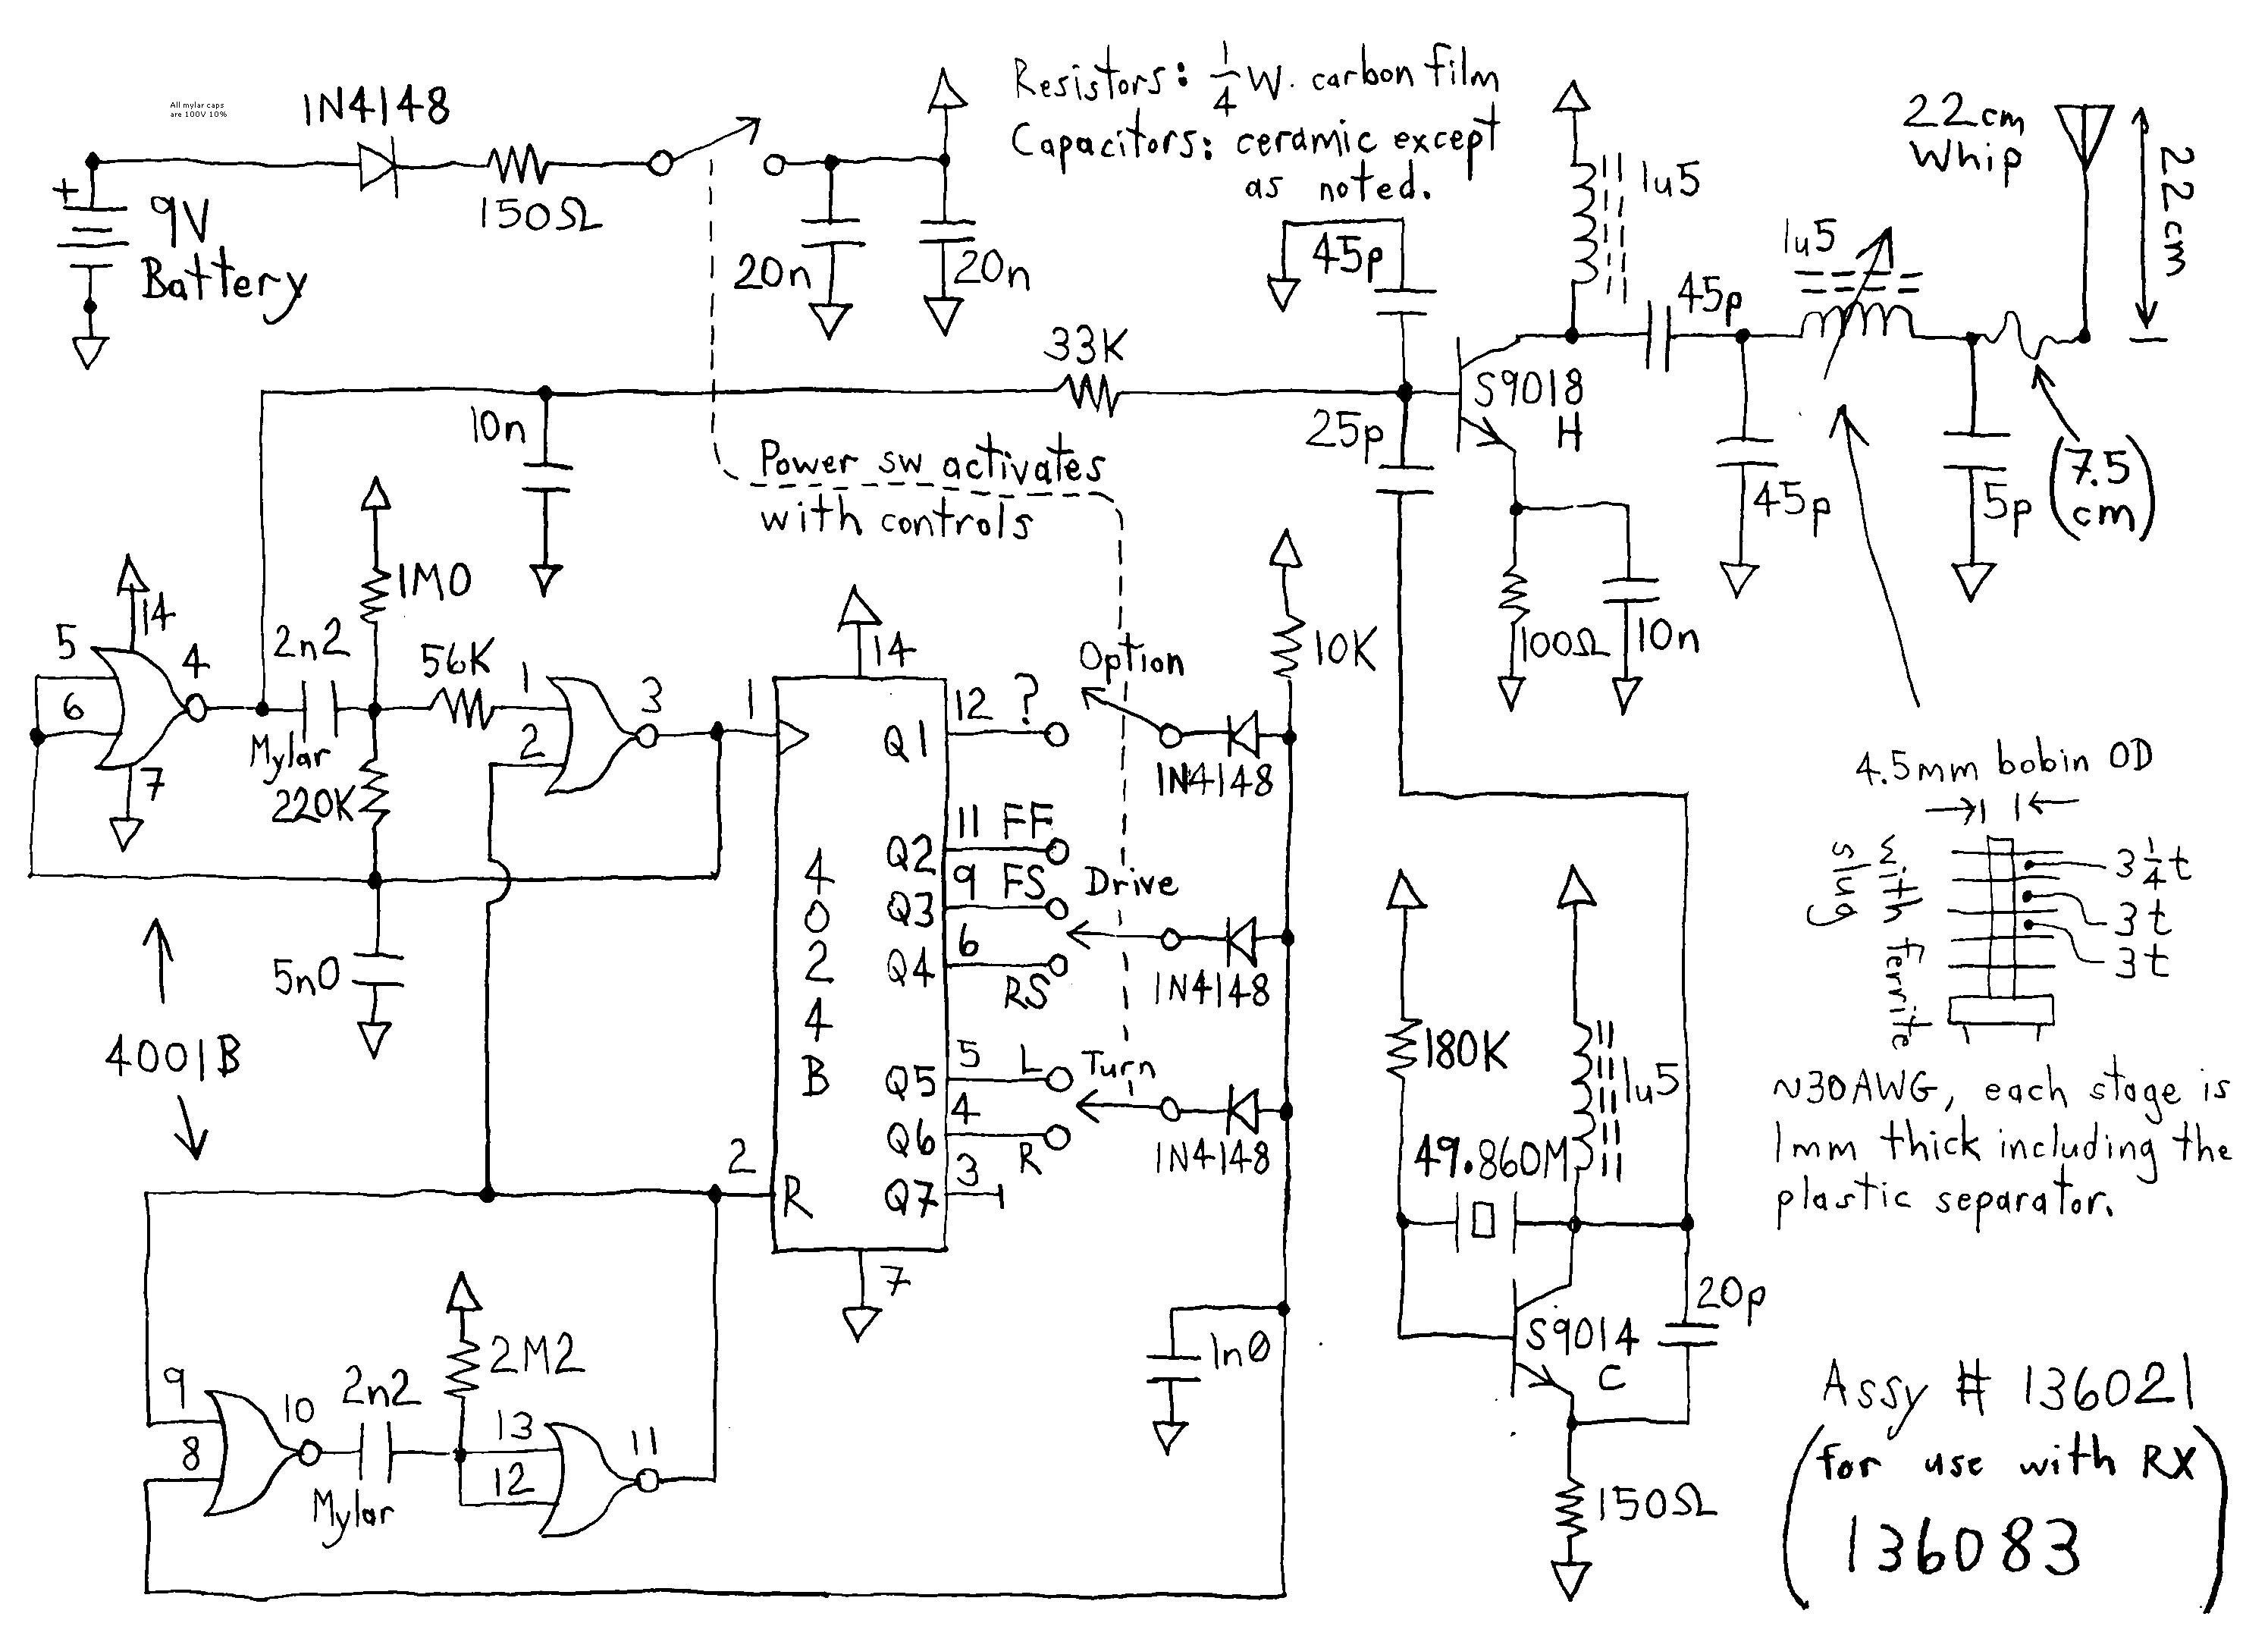 Car Amplifier Diagram Multiple Amplifier Wiring Diagram Best Amp Wiring Diagram Car Of Car Amplifier Diagram